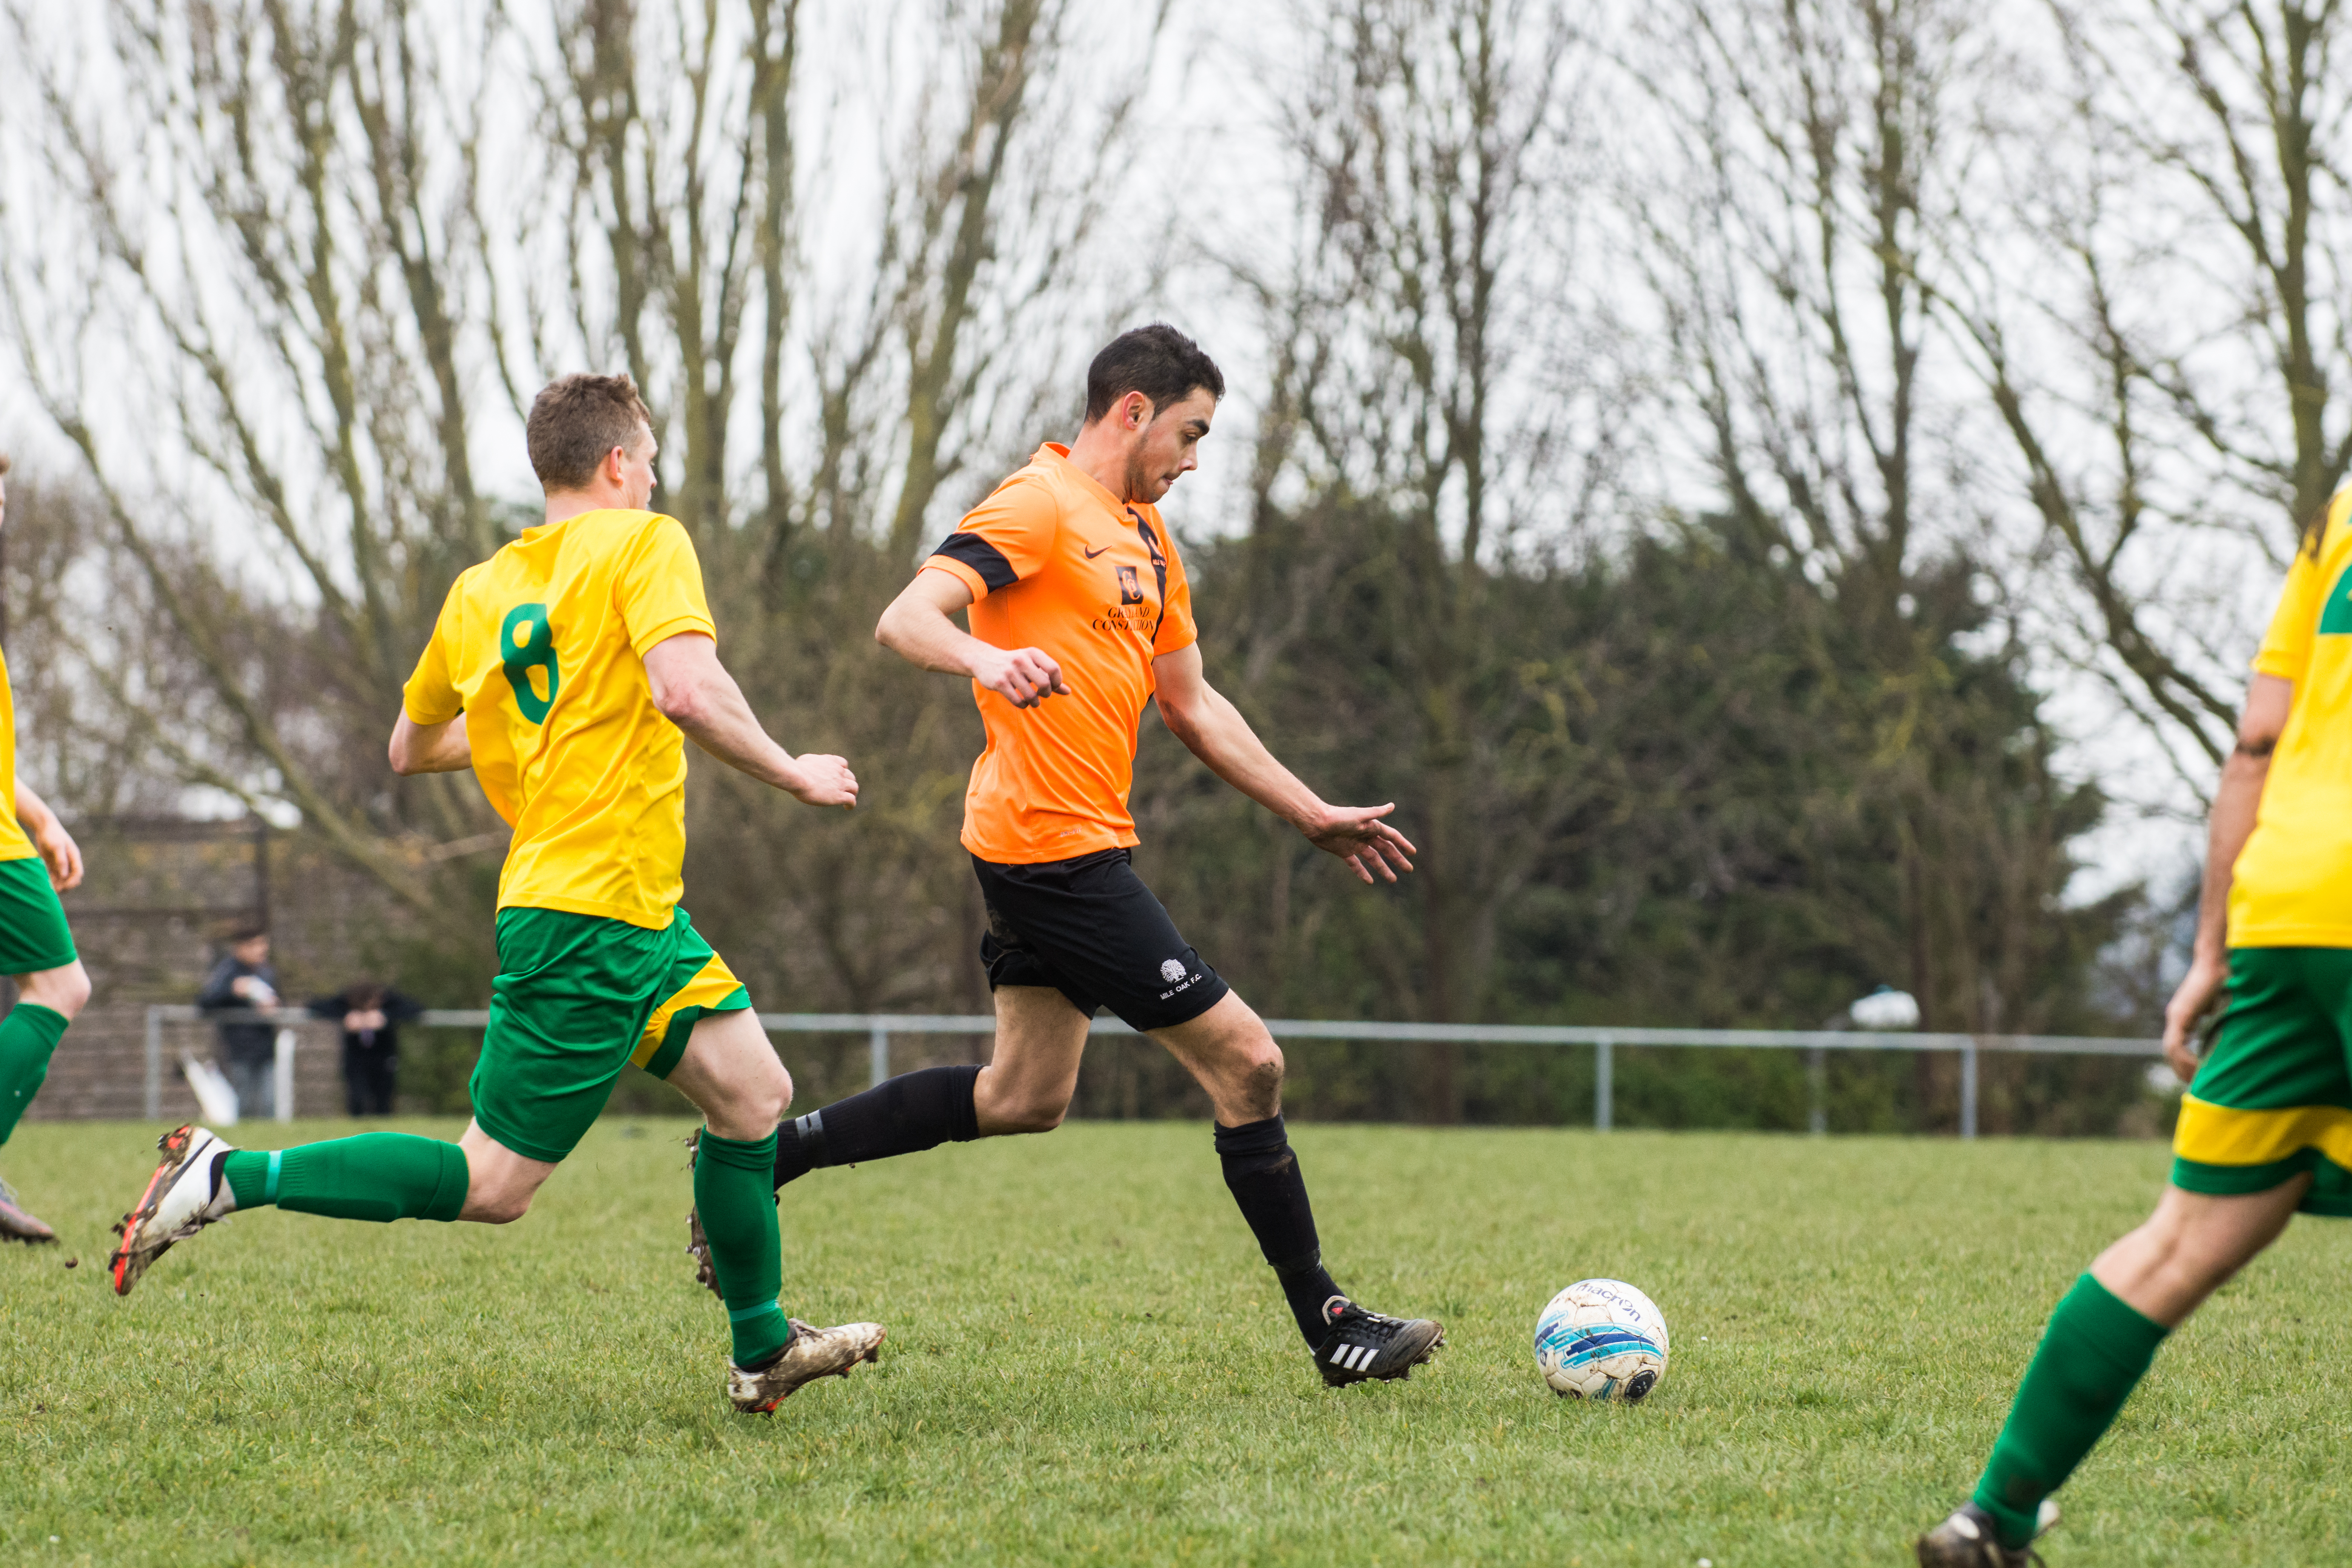 DAVID_JEFFERY Mile Oak FC vs Hailsham Town FC 24.03.18 23